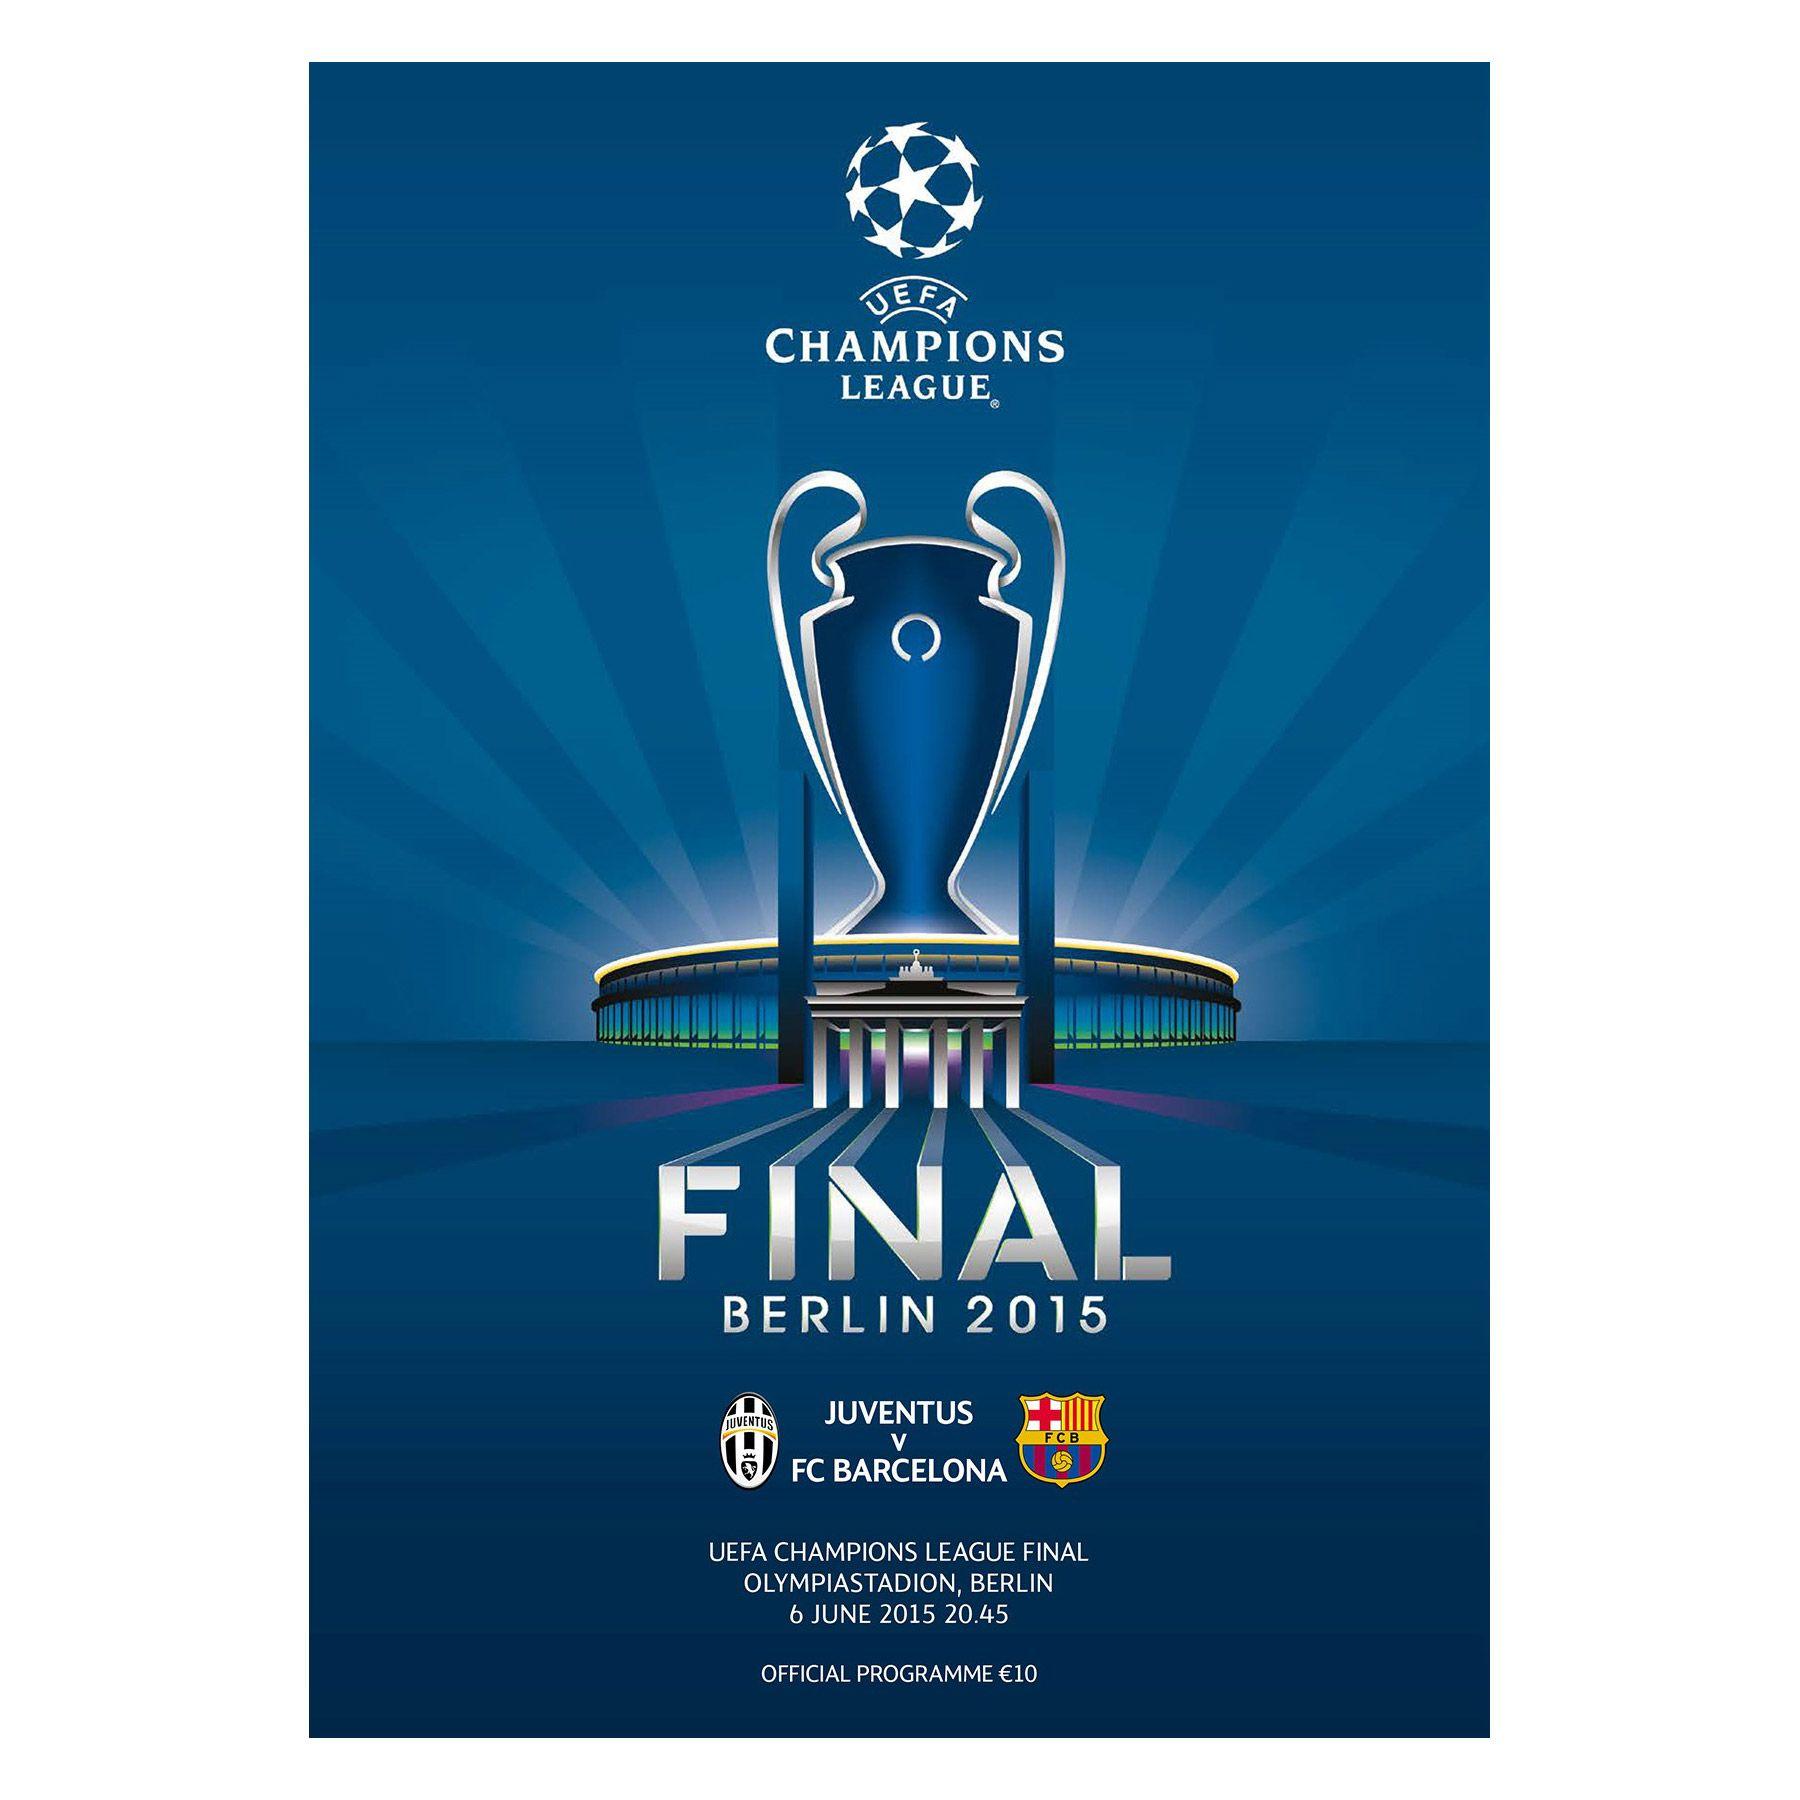 UEFA Champions League Final Berlin 2015